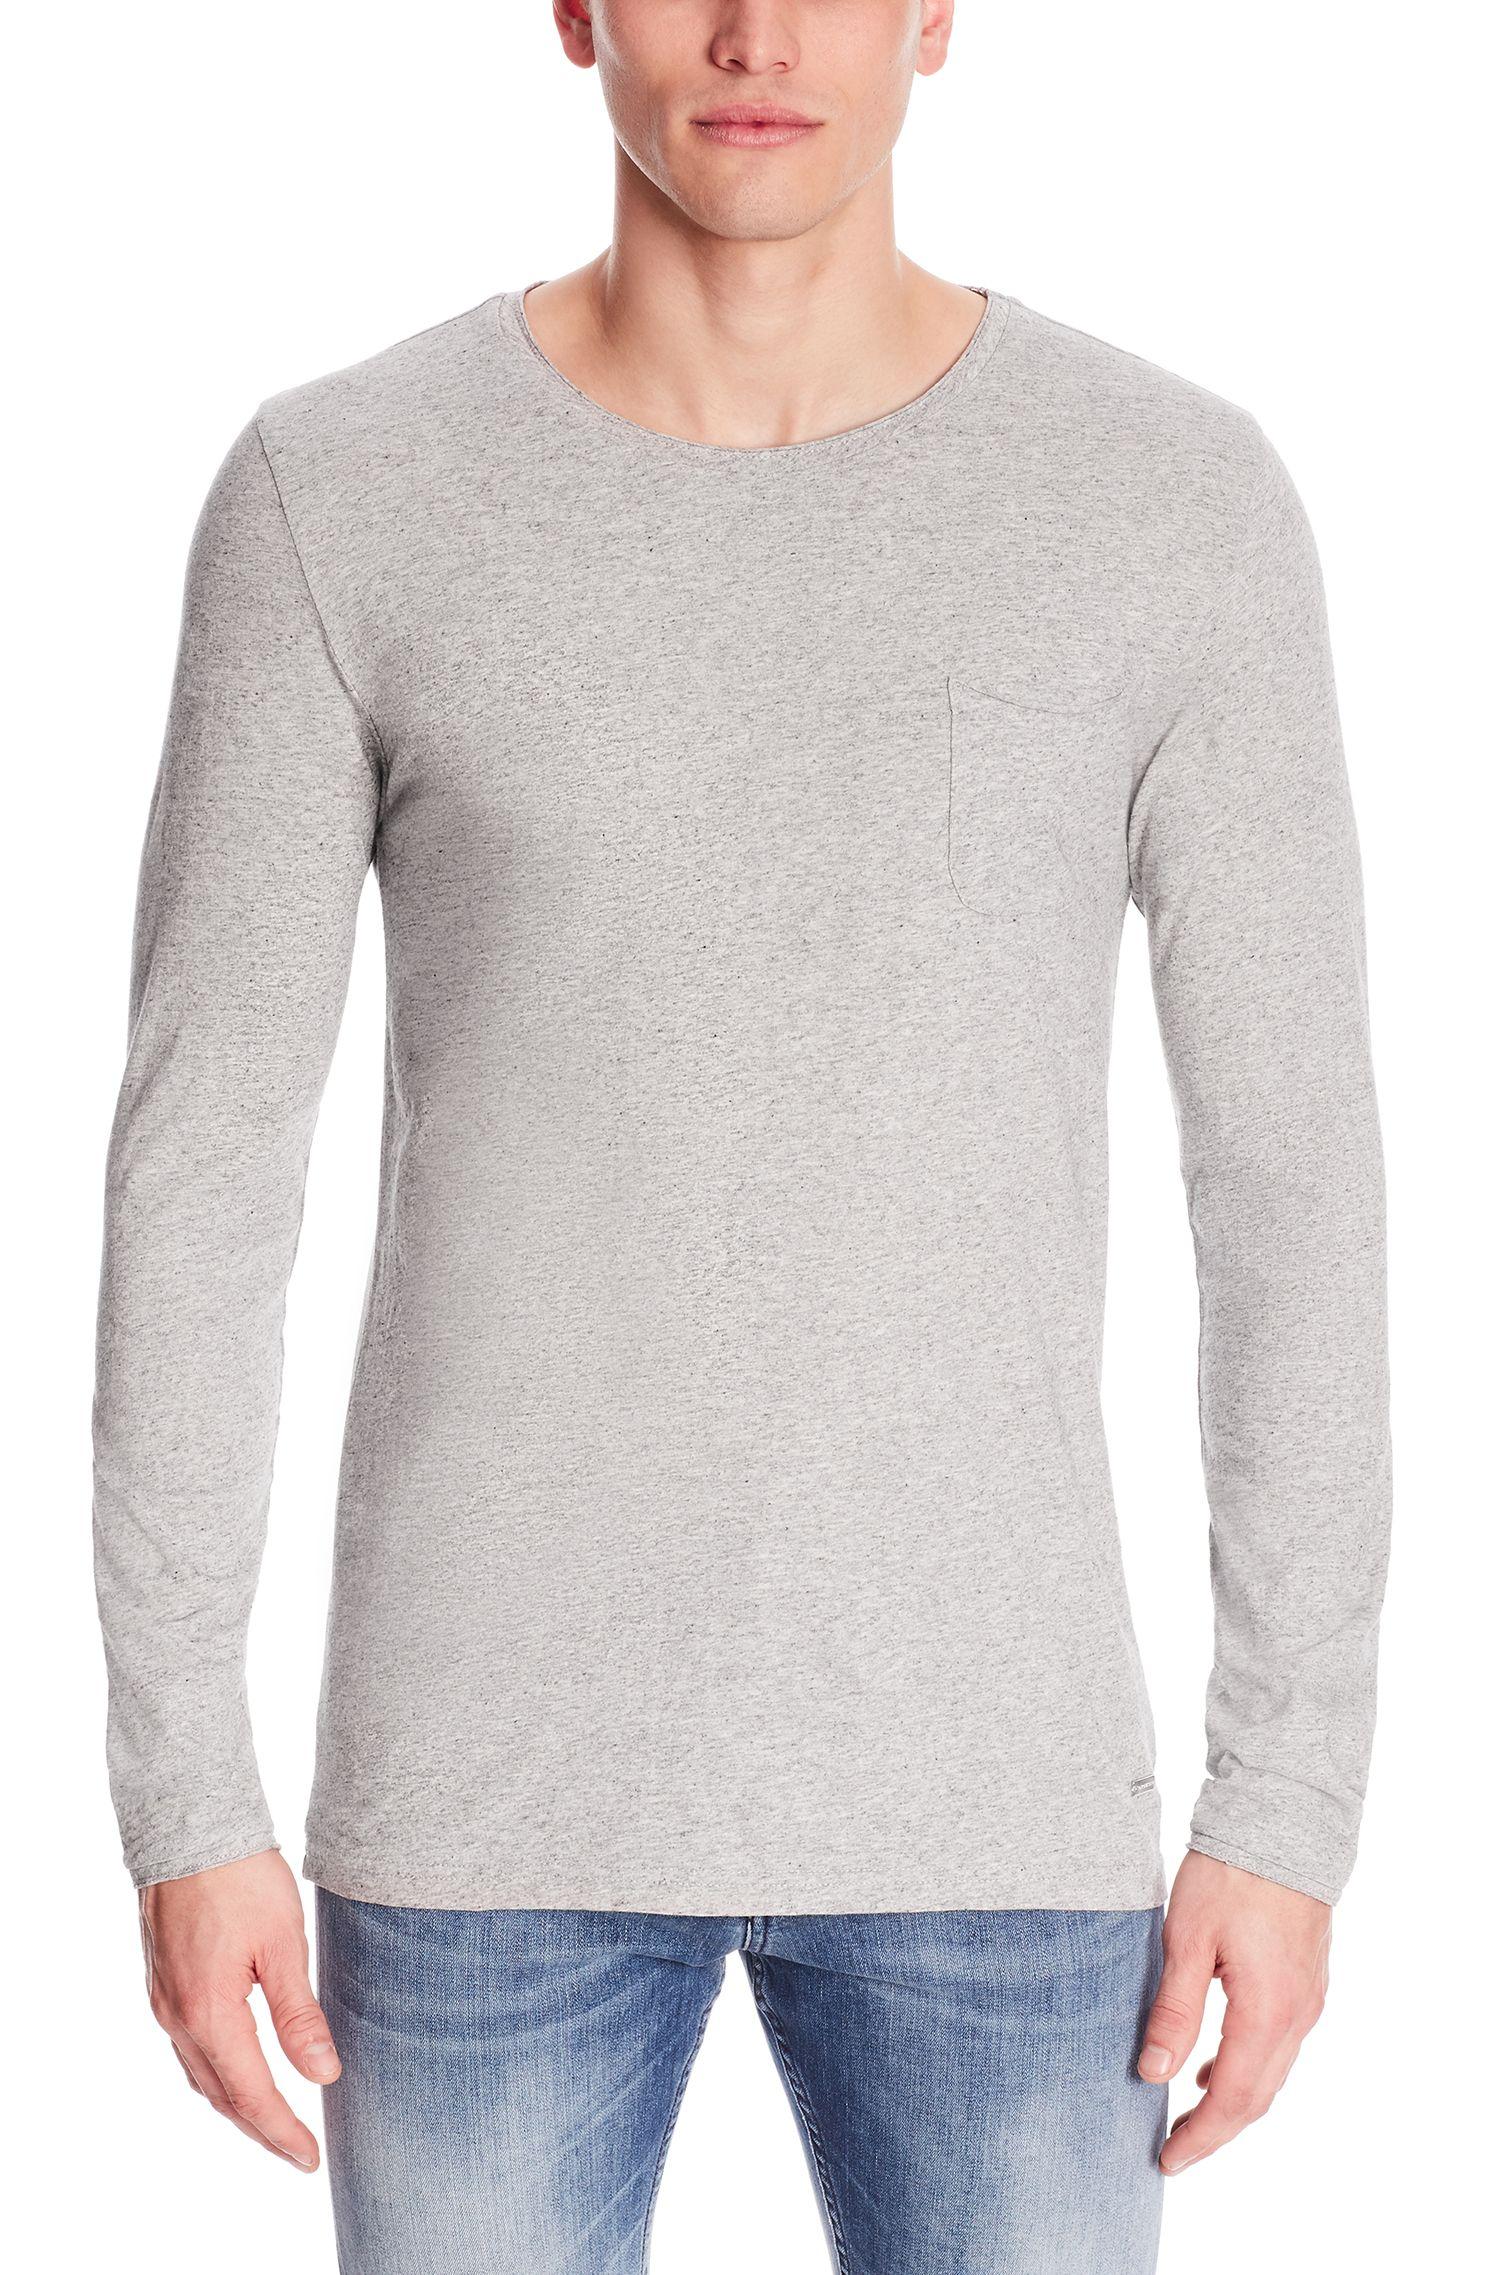 Cotton Melange T-Shirt | Terrence